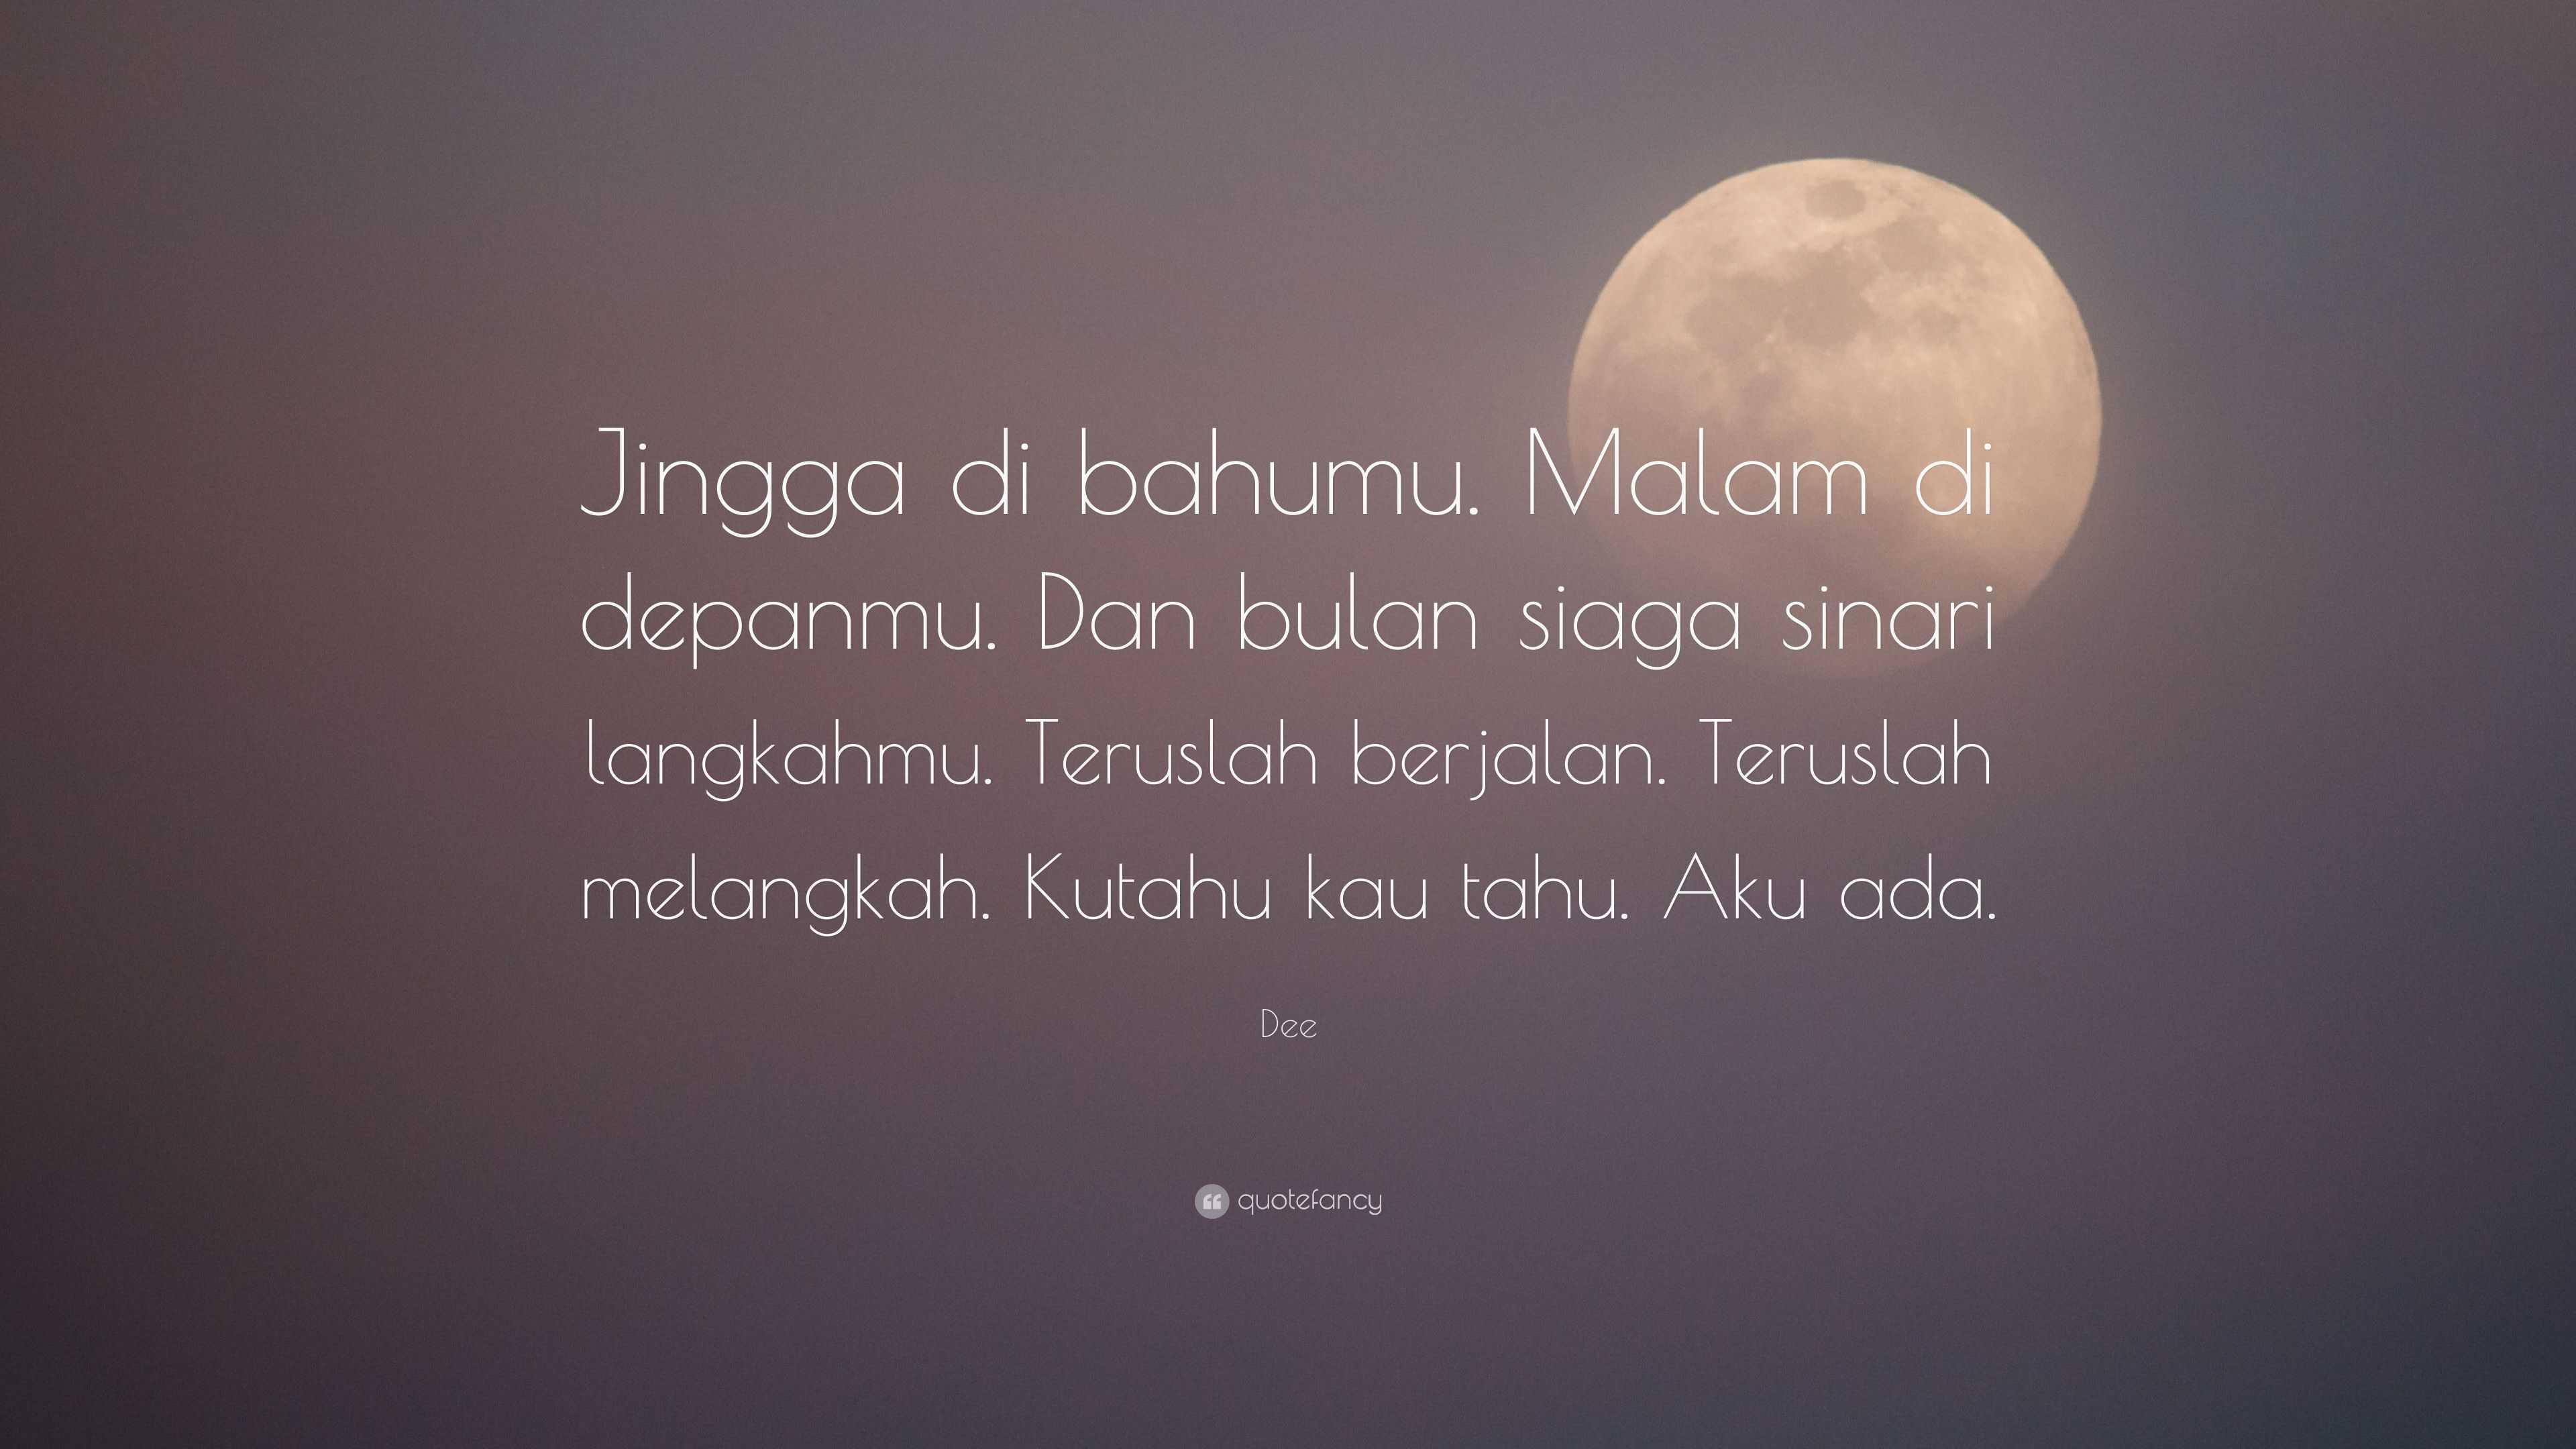 Bahu Quotes